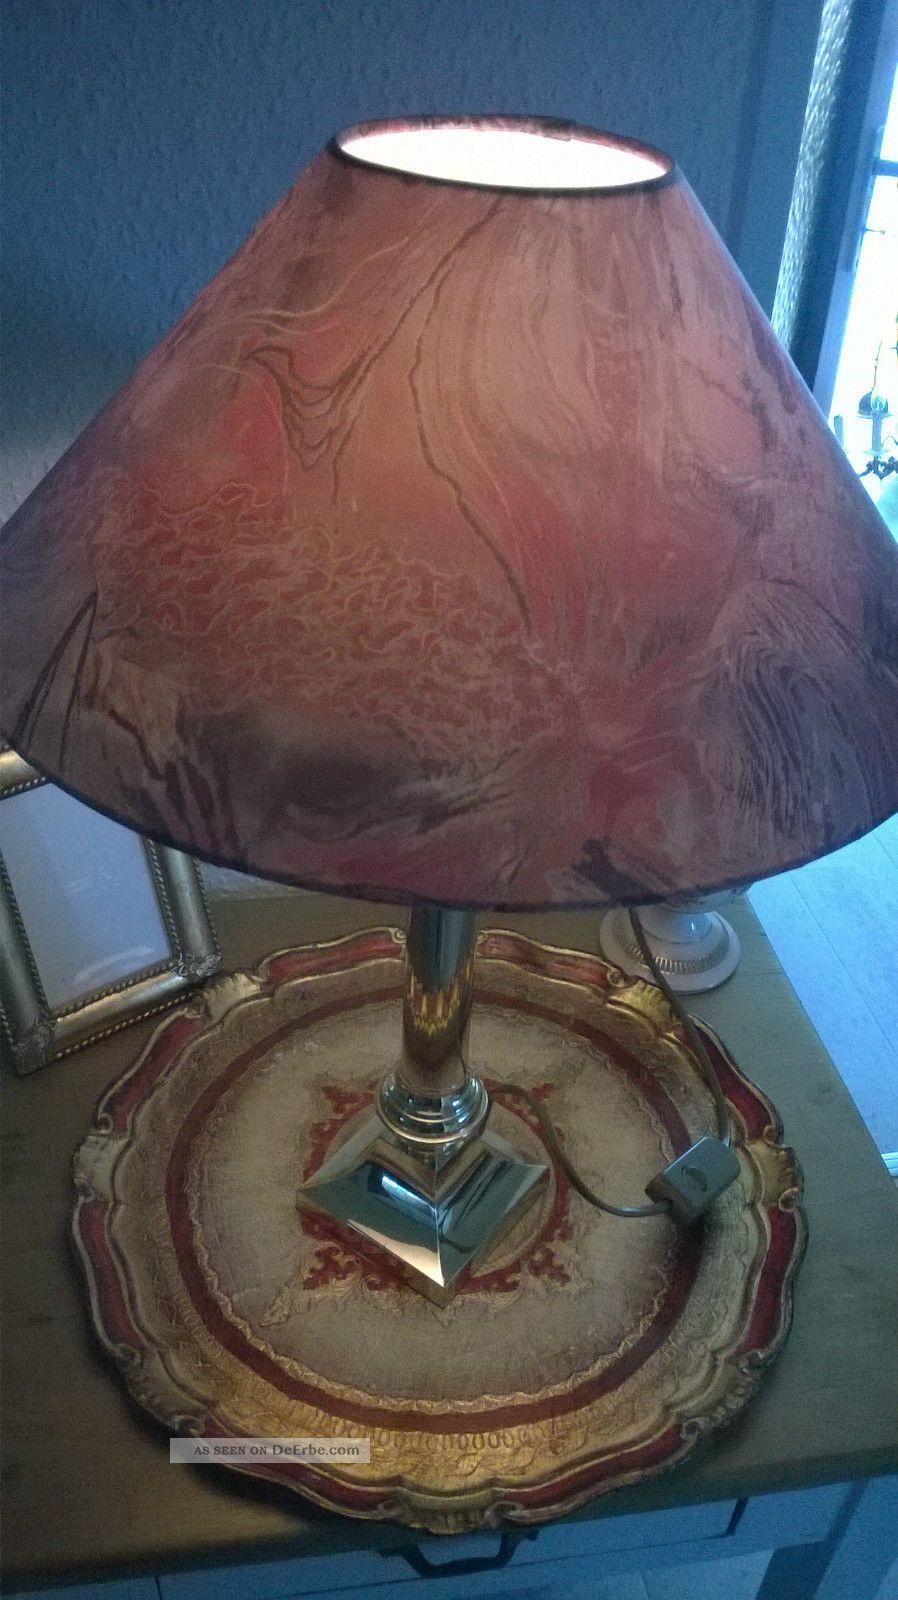 tischlampe messing stoffschirm rotfarben 50cm hoch top. Black Bedroom Furniture Sets. Home Design Ideas